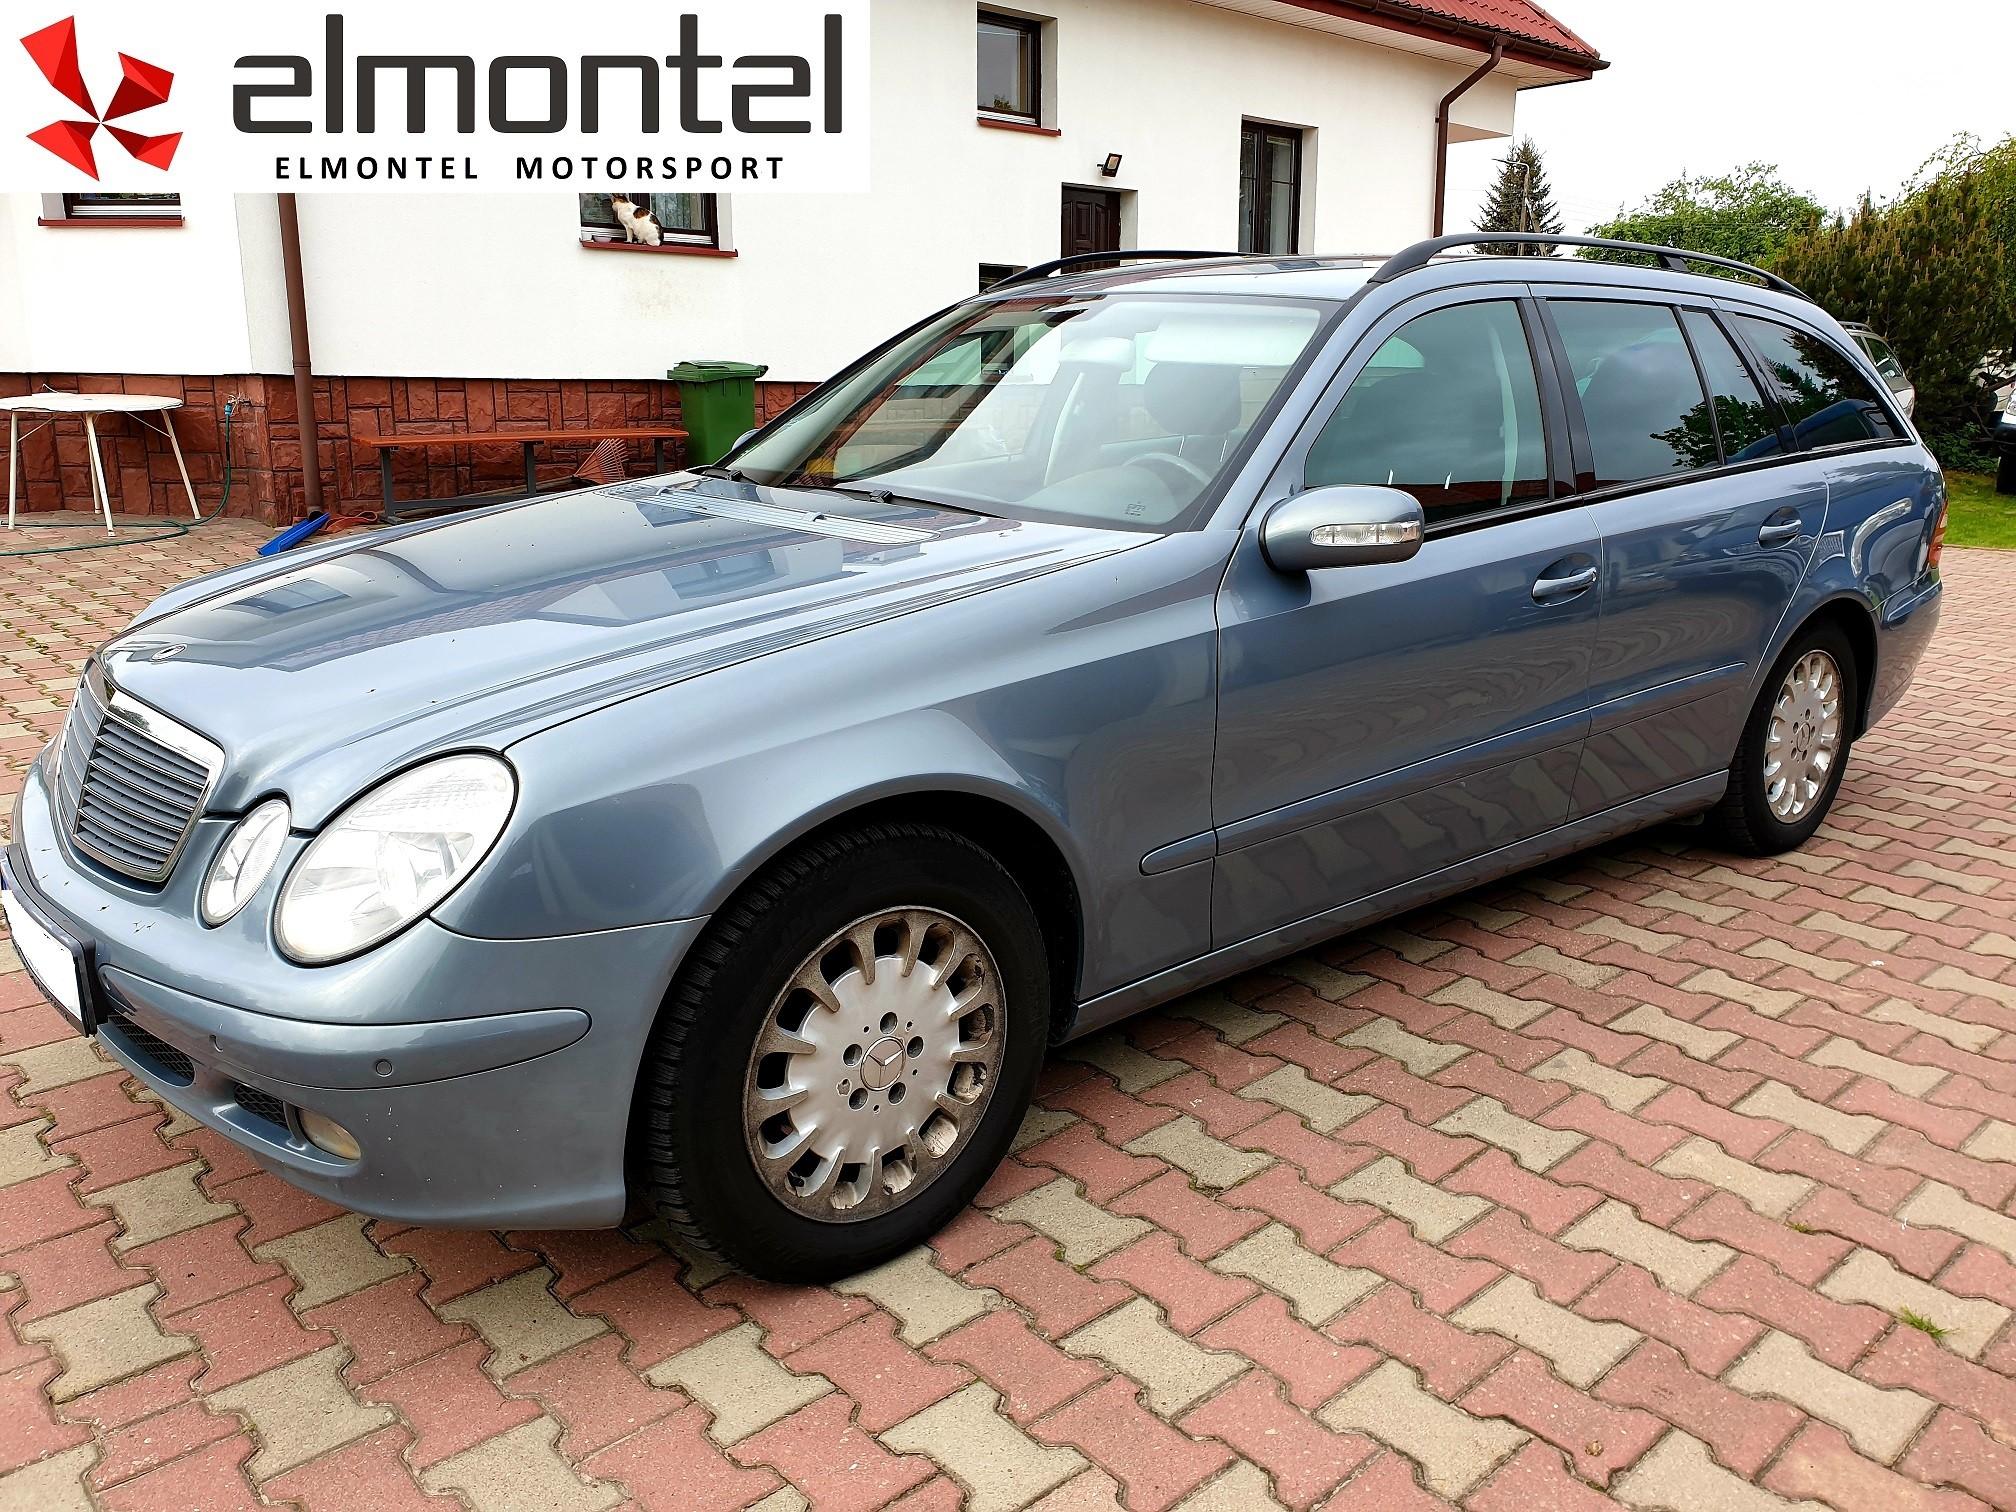 Mercedes-Benz E280 3.0 V6 CDI 190 KM 2005